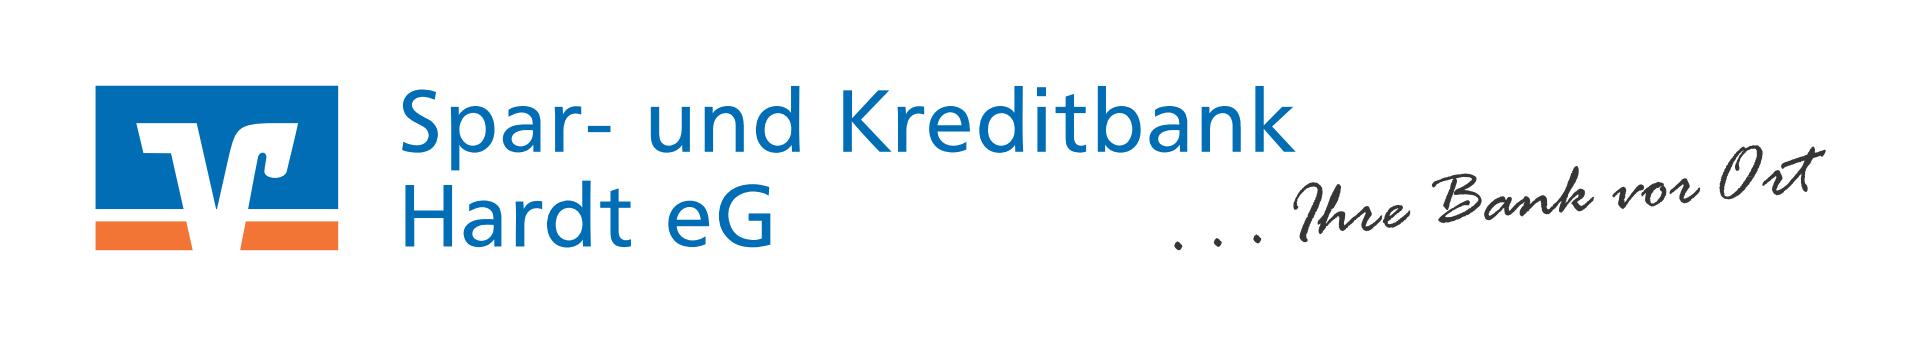 Spar- und Kreditbank Hardt eG